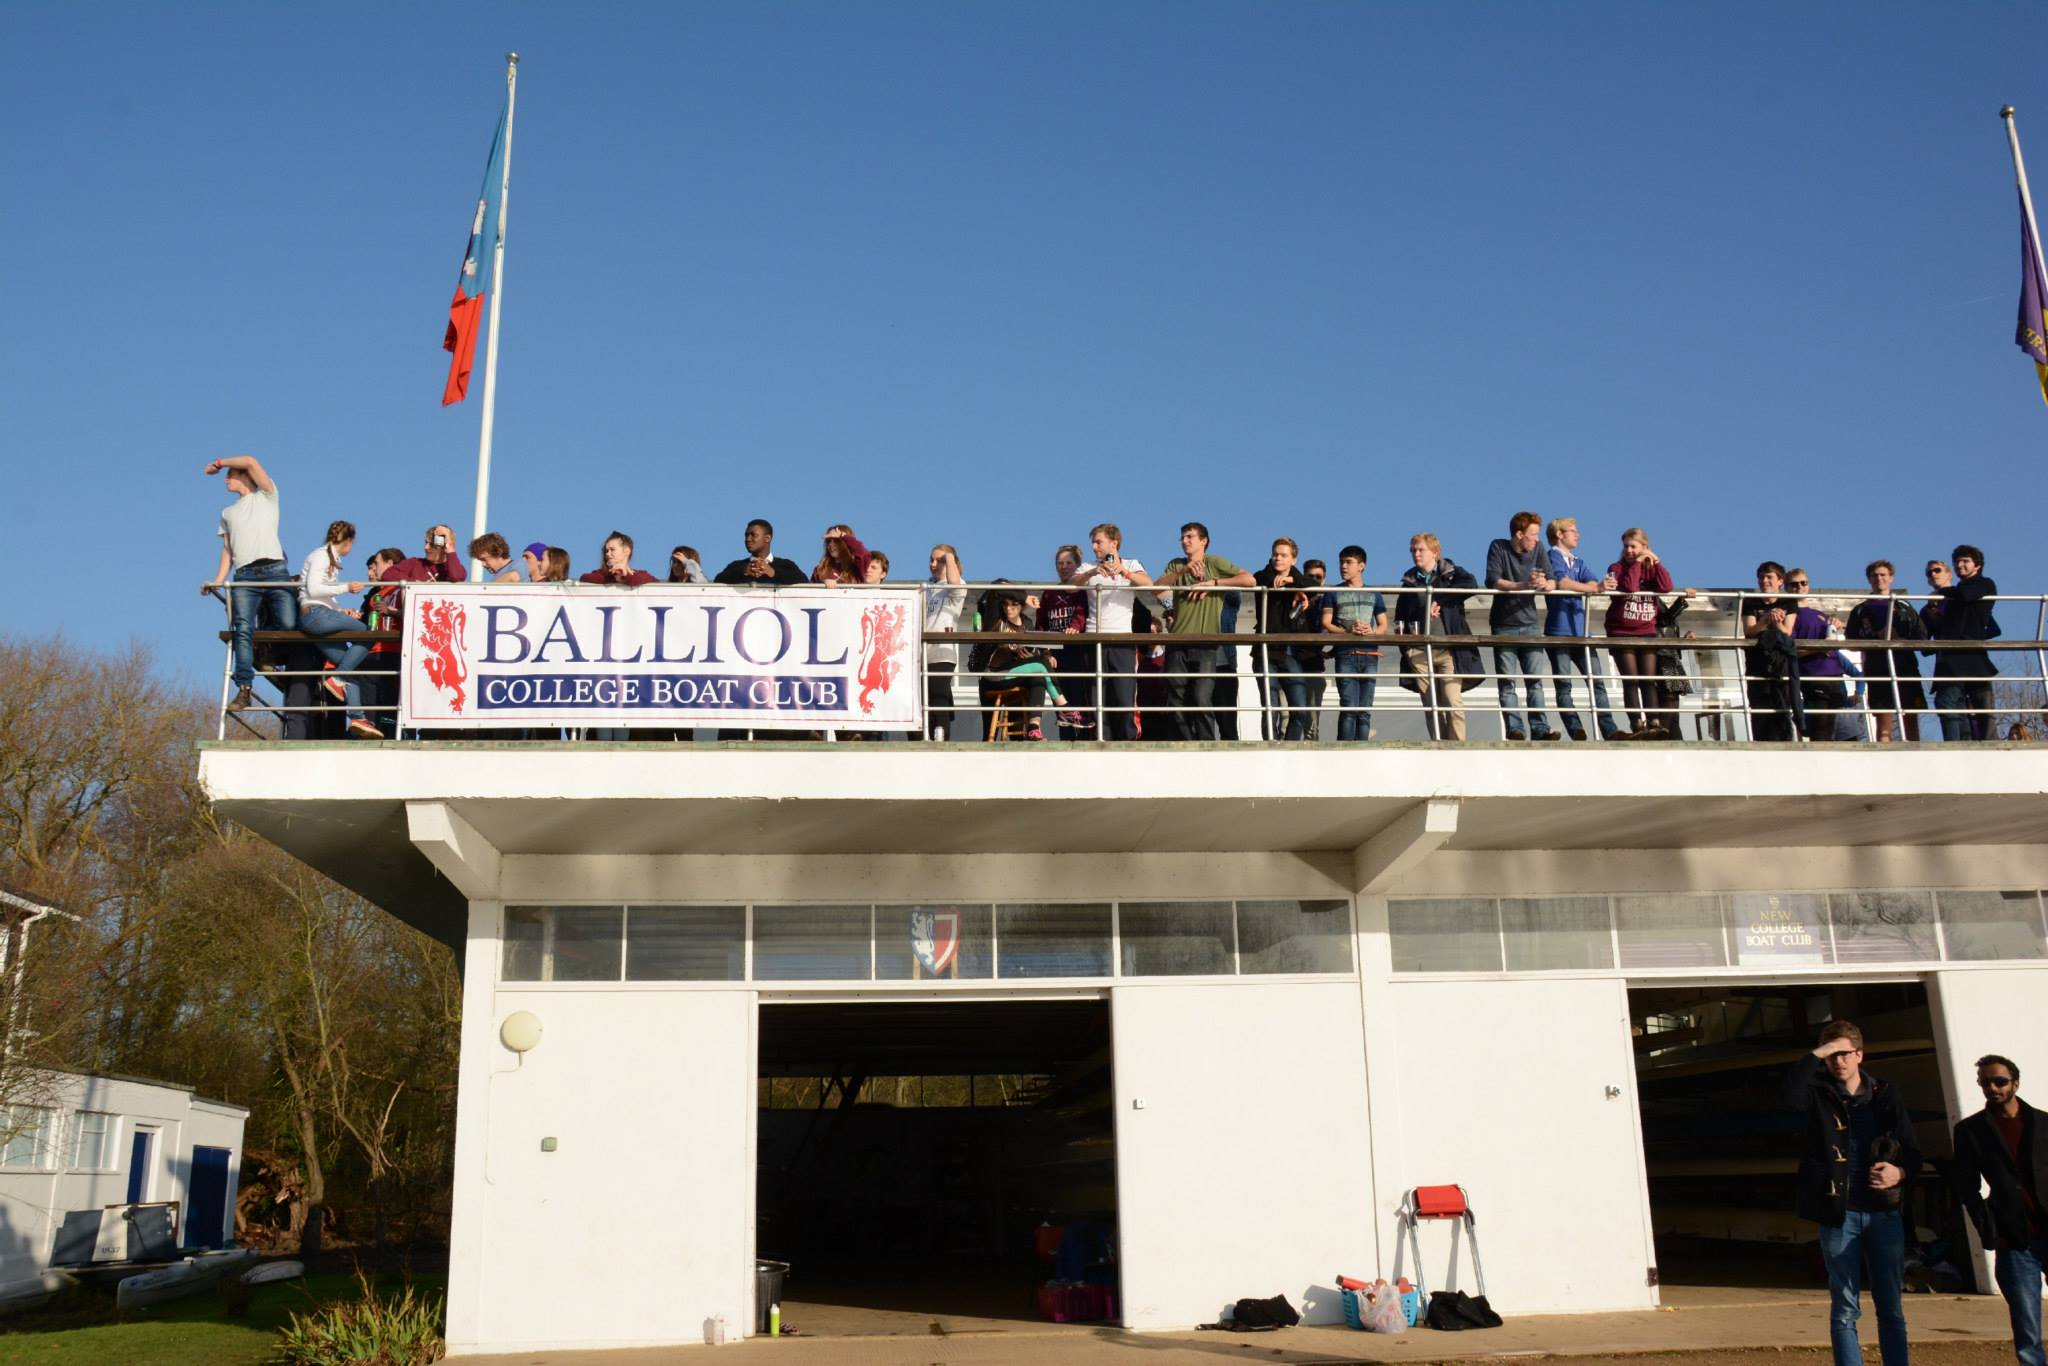 Balliol College Boathouse